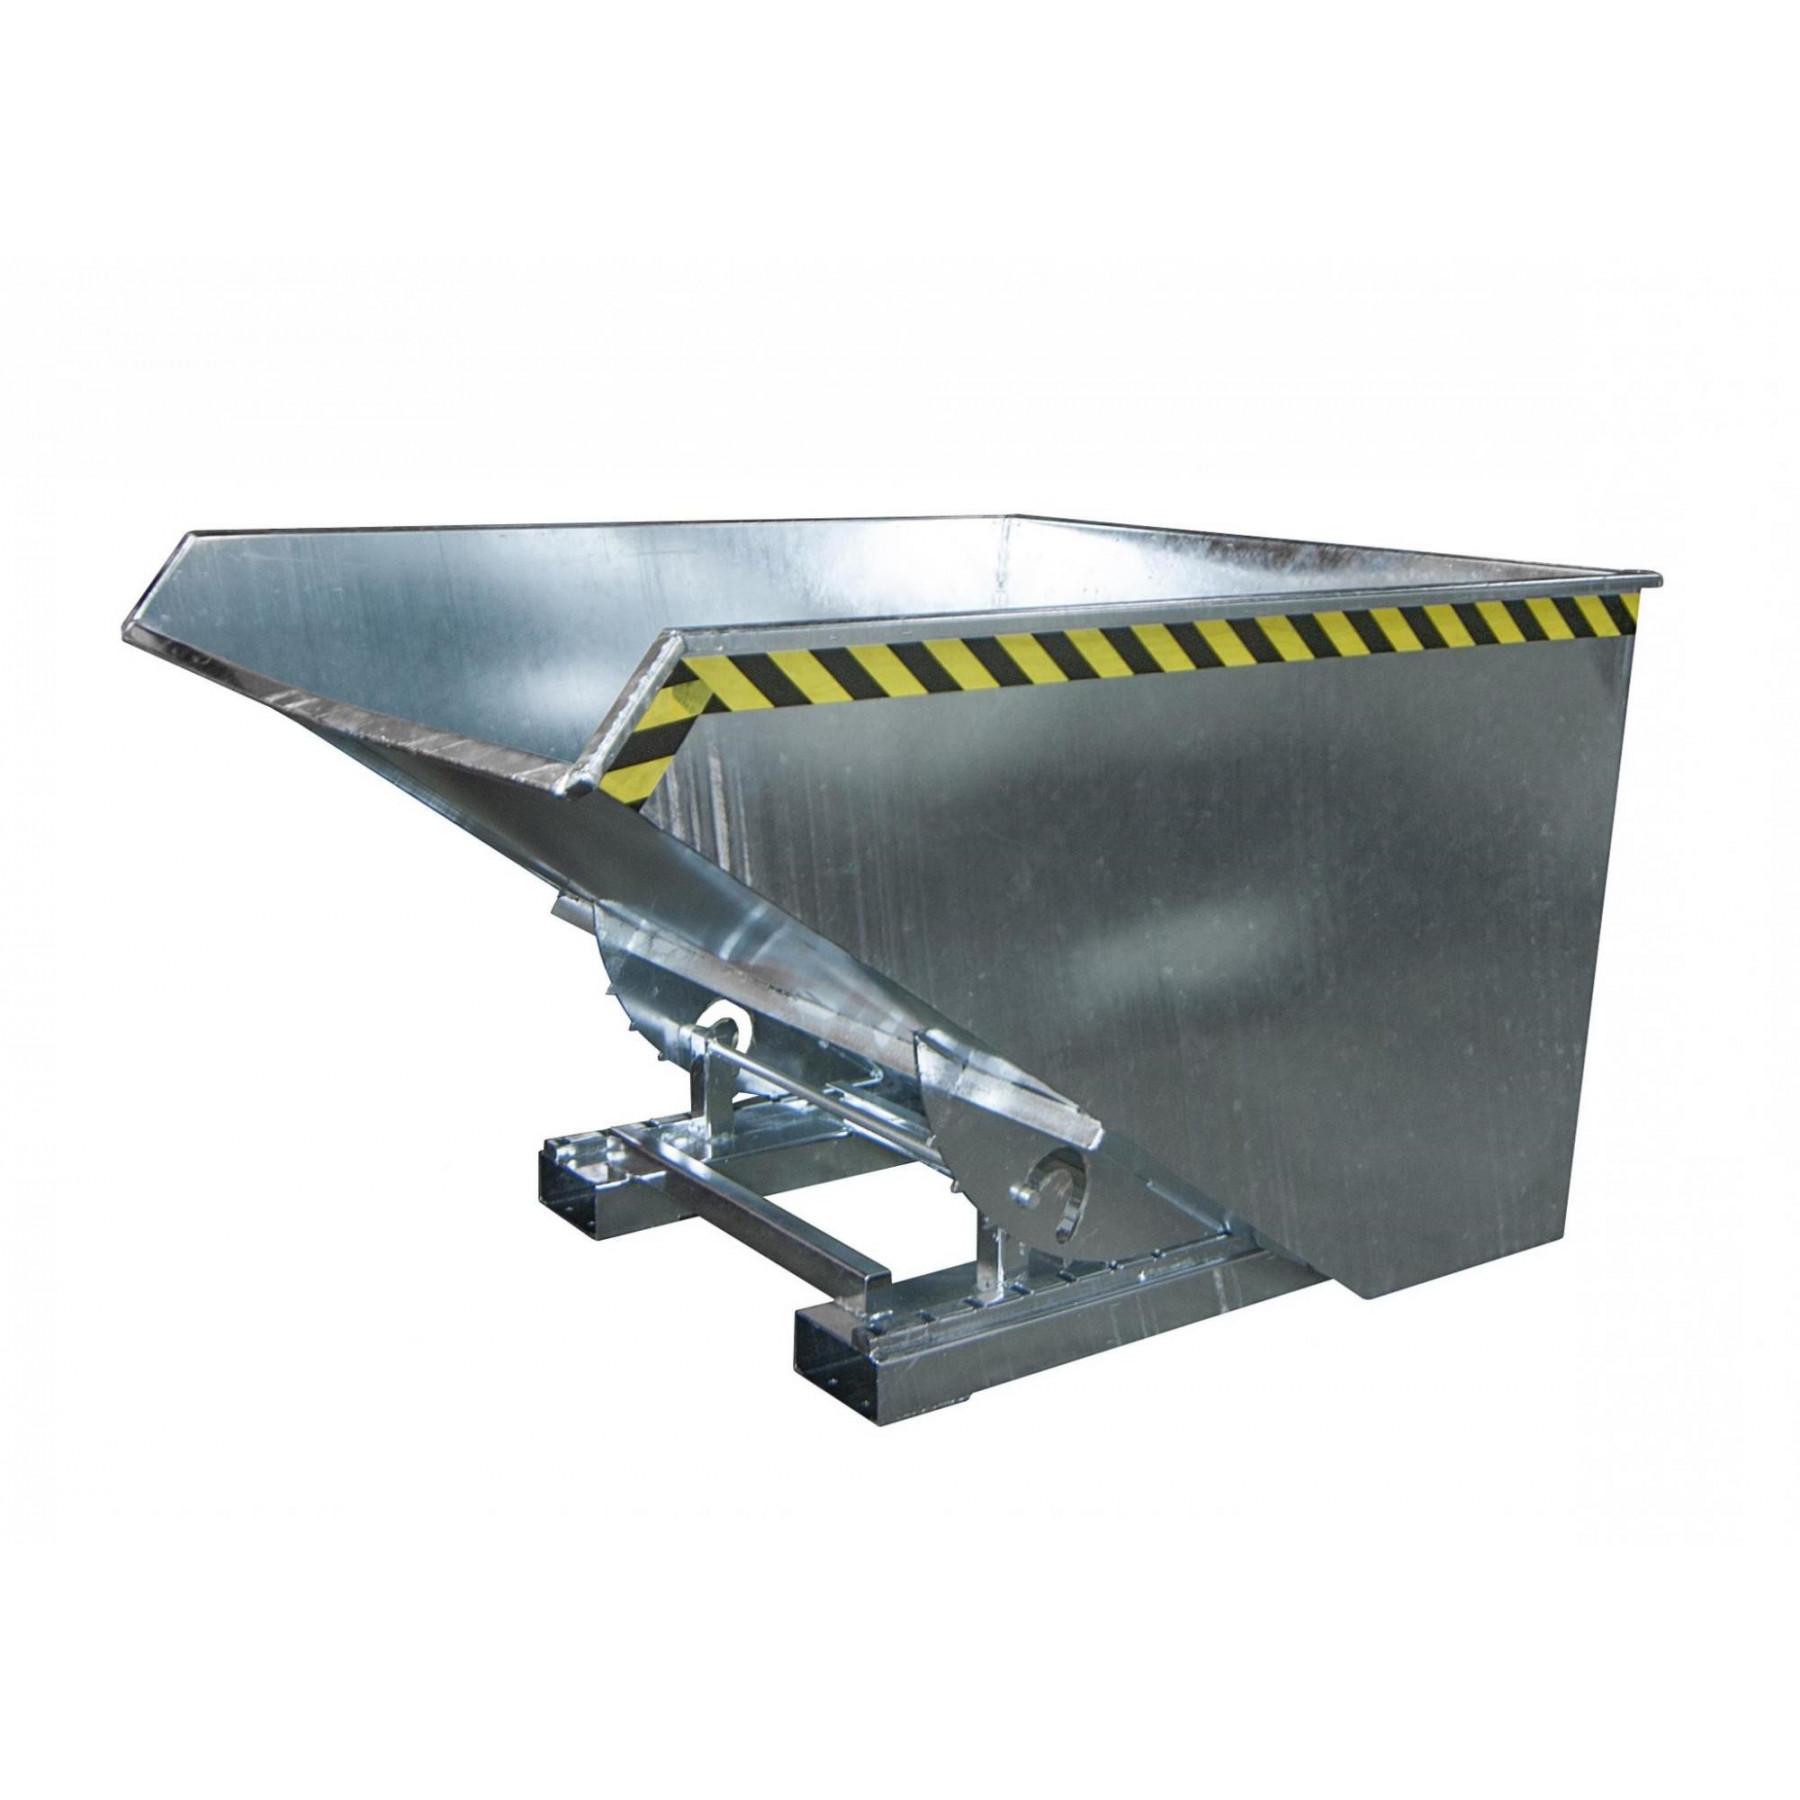 Kiepcontainer 1200 liter, hoog model, MTF-1200-V